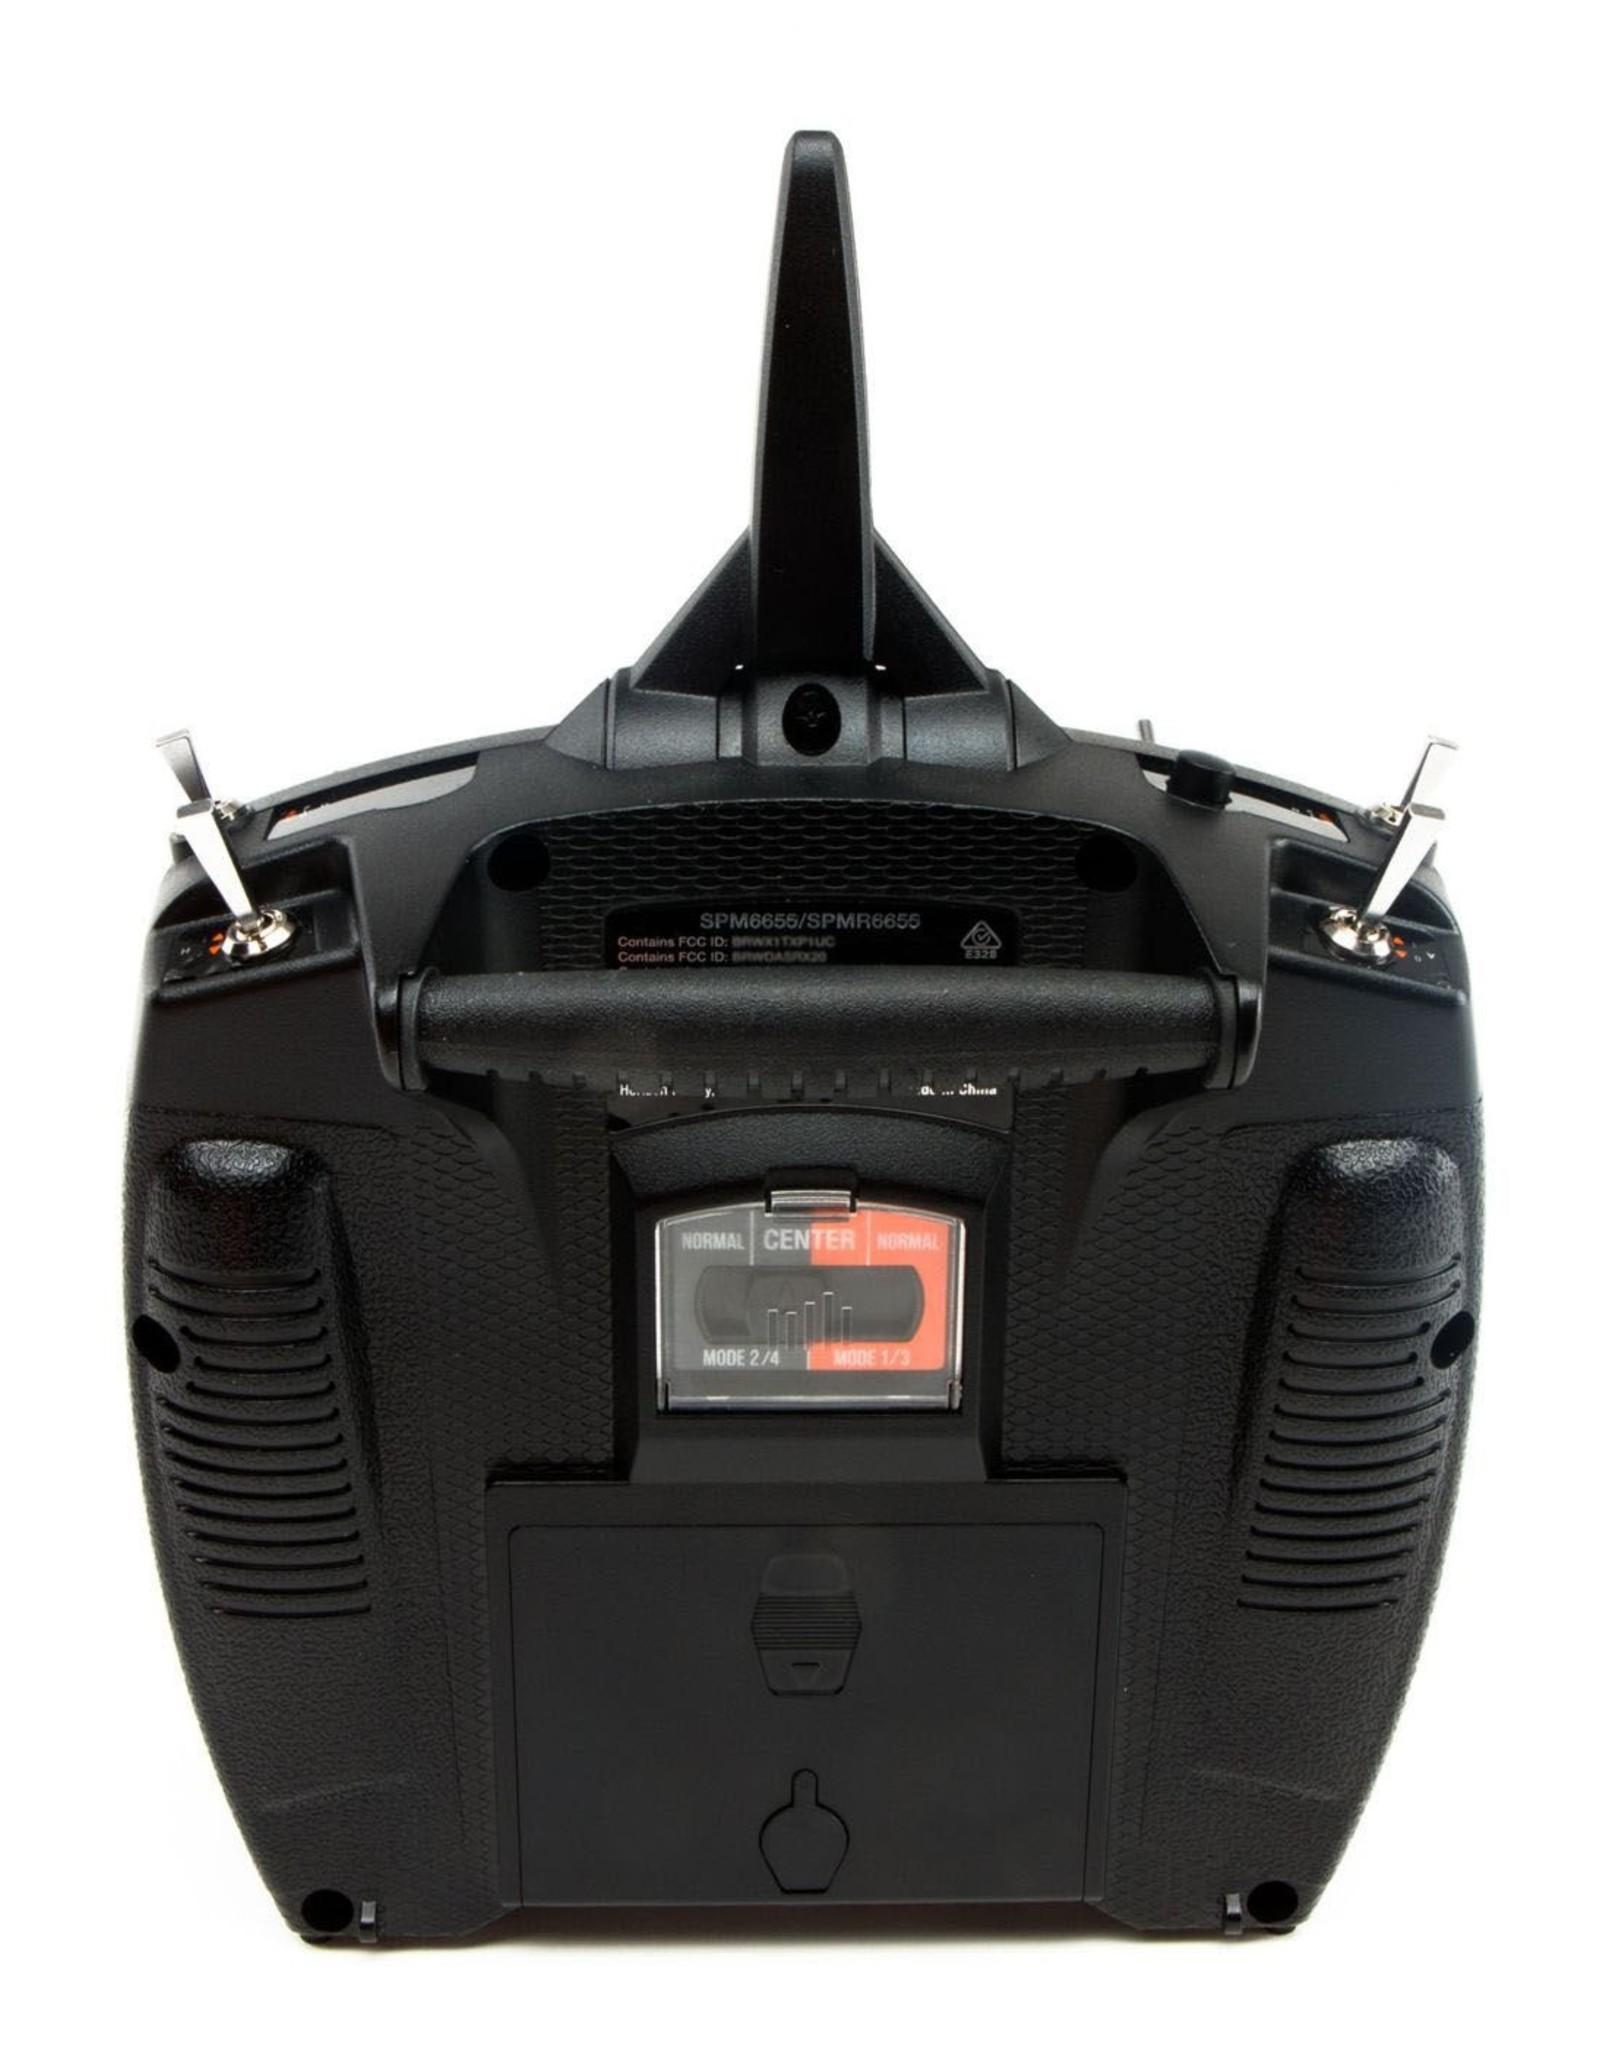 Spektrum Spektrum DX6e 6-Channel DSMX Transmitter Only